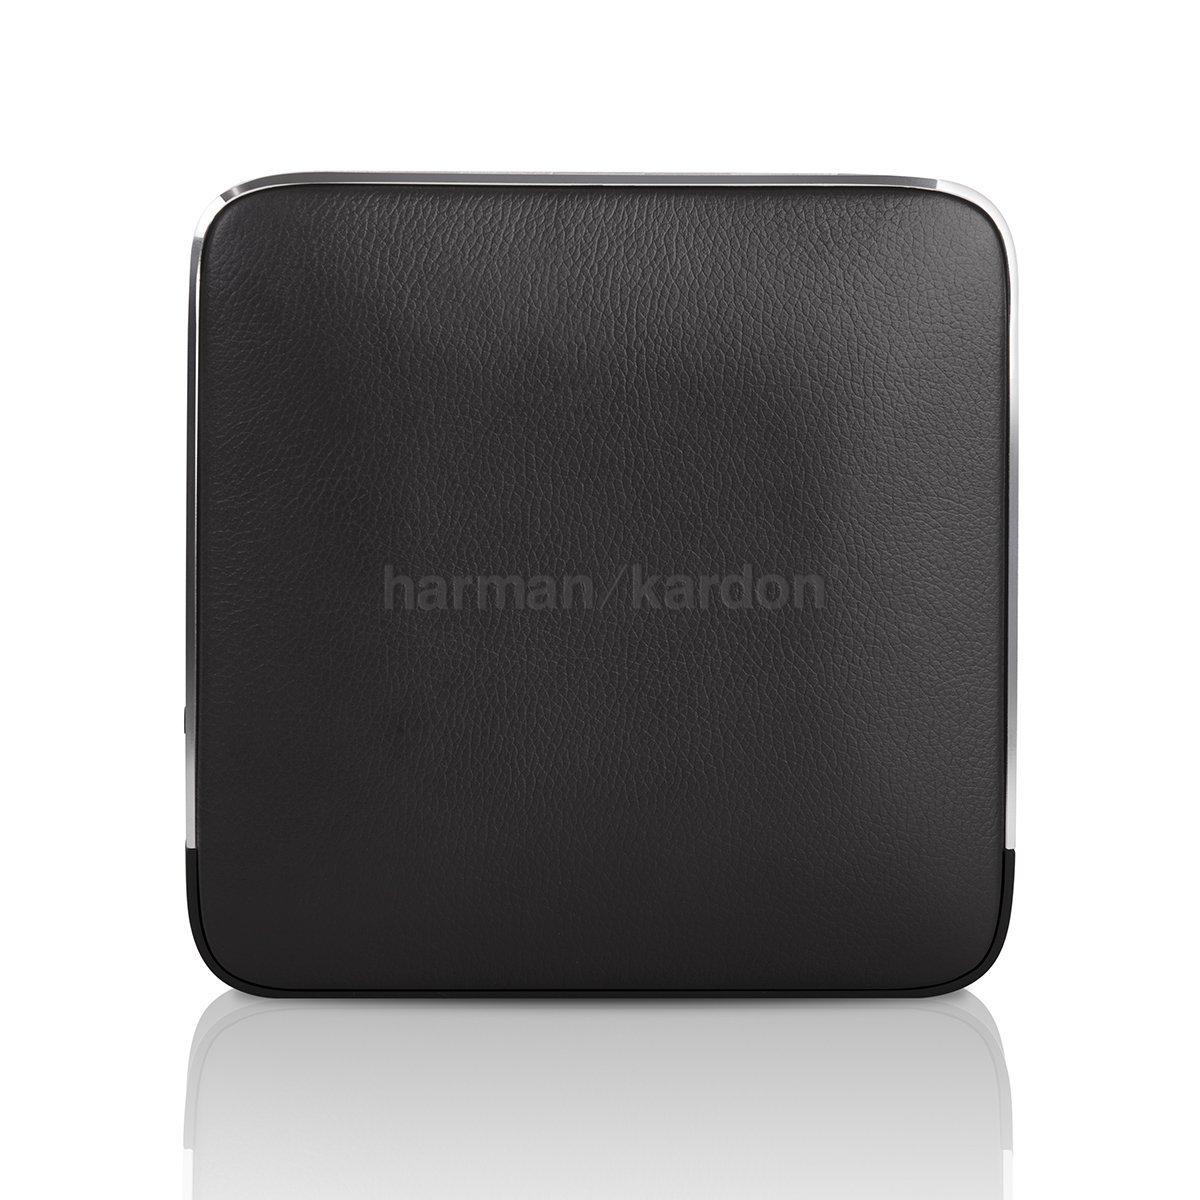 Bocina Harman Kardon Esquire Bluetooth 2x10 Watts Con